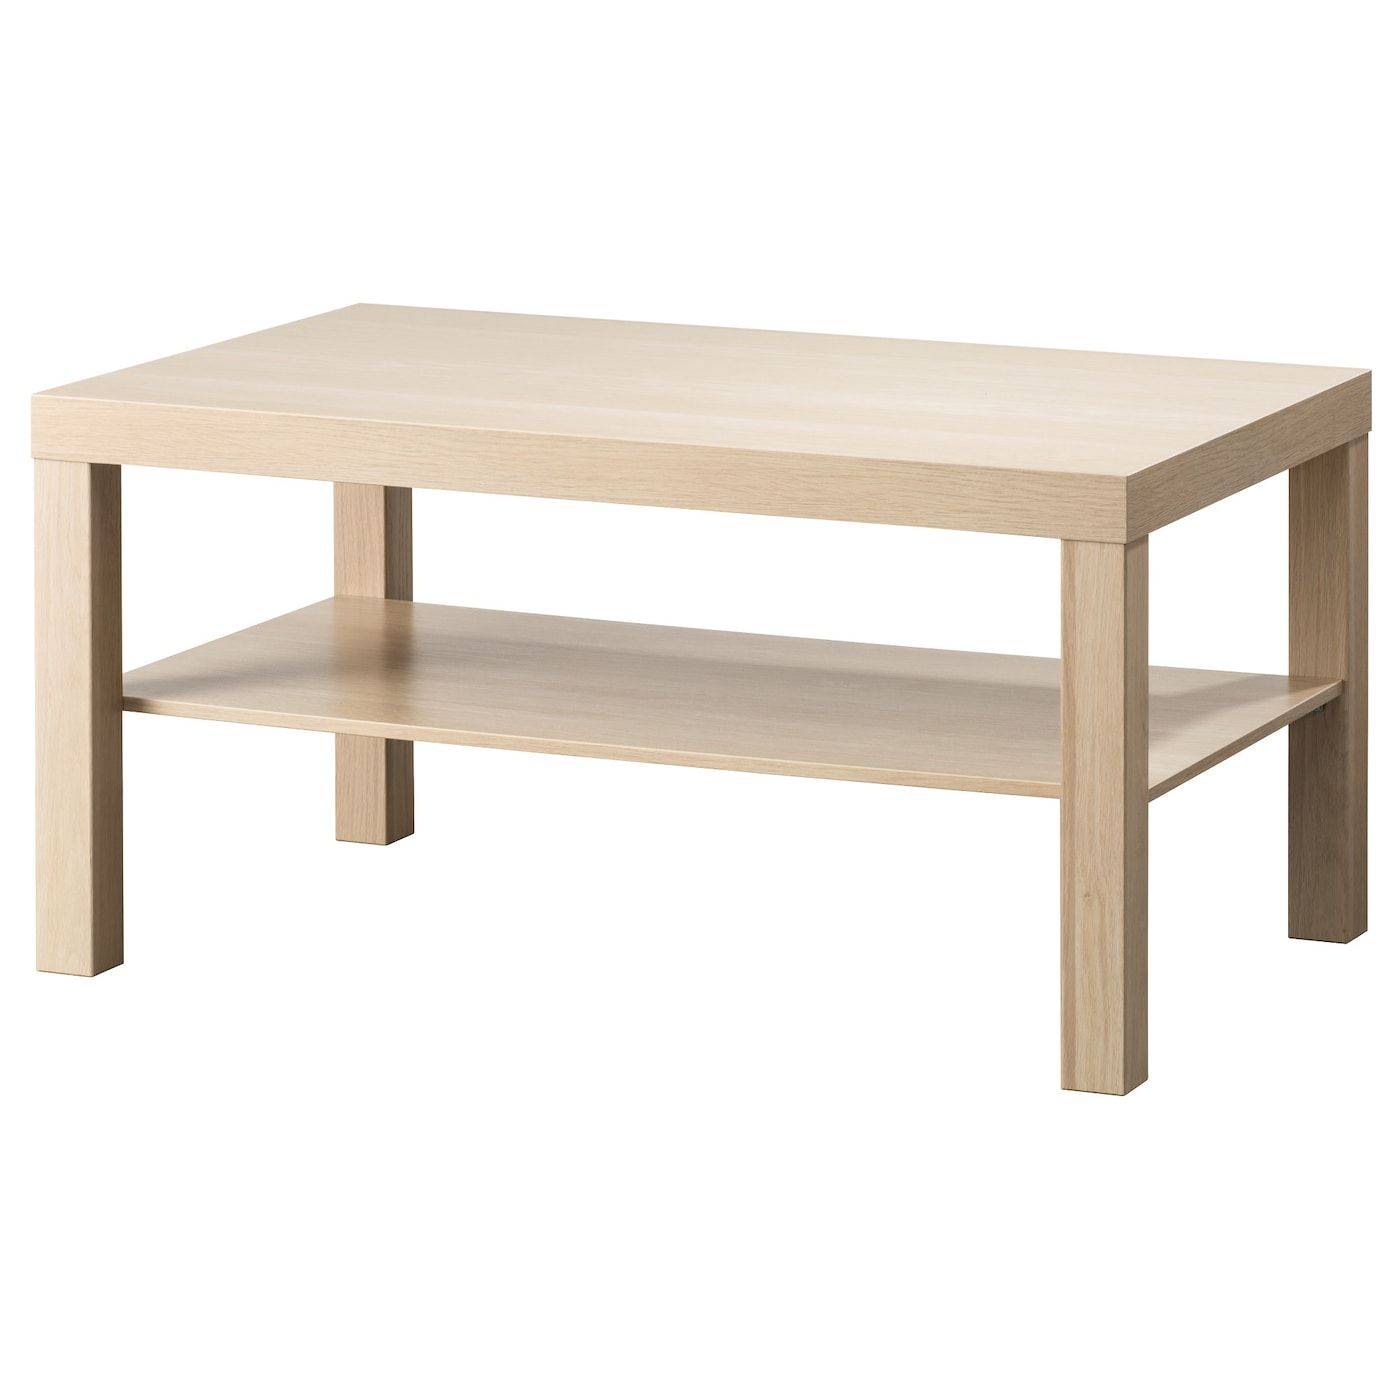 Lack Table Basse Effet Chene Blanchi 90x55 Cm Ikea Lack Coffee Table Ikea Lack Coffee Table Coffee Table